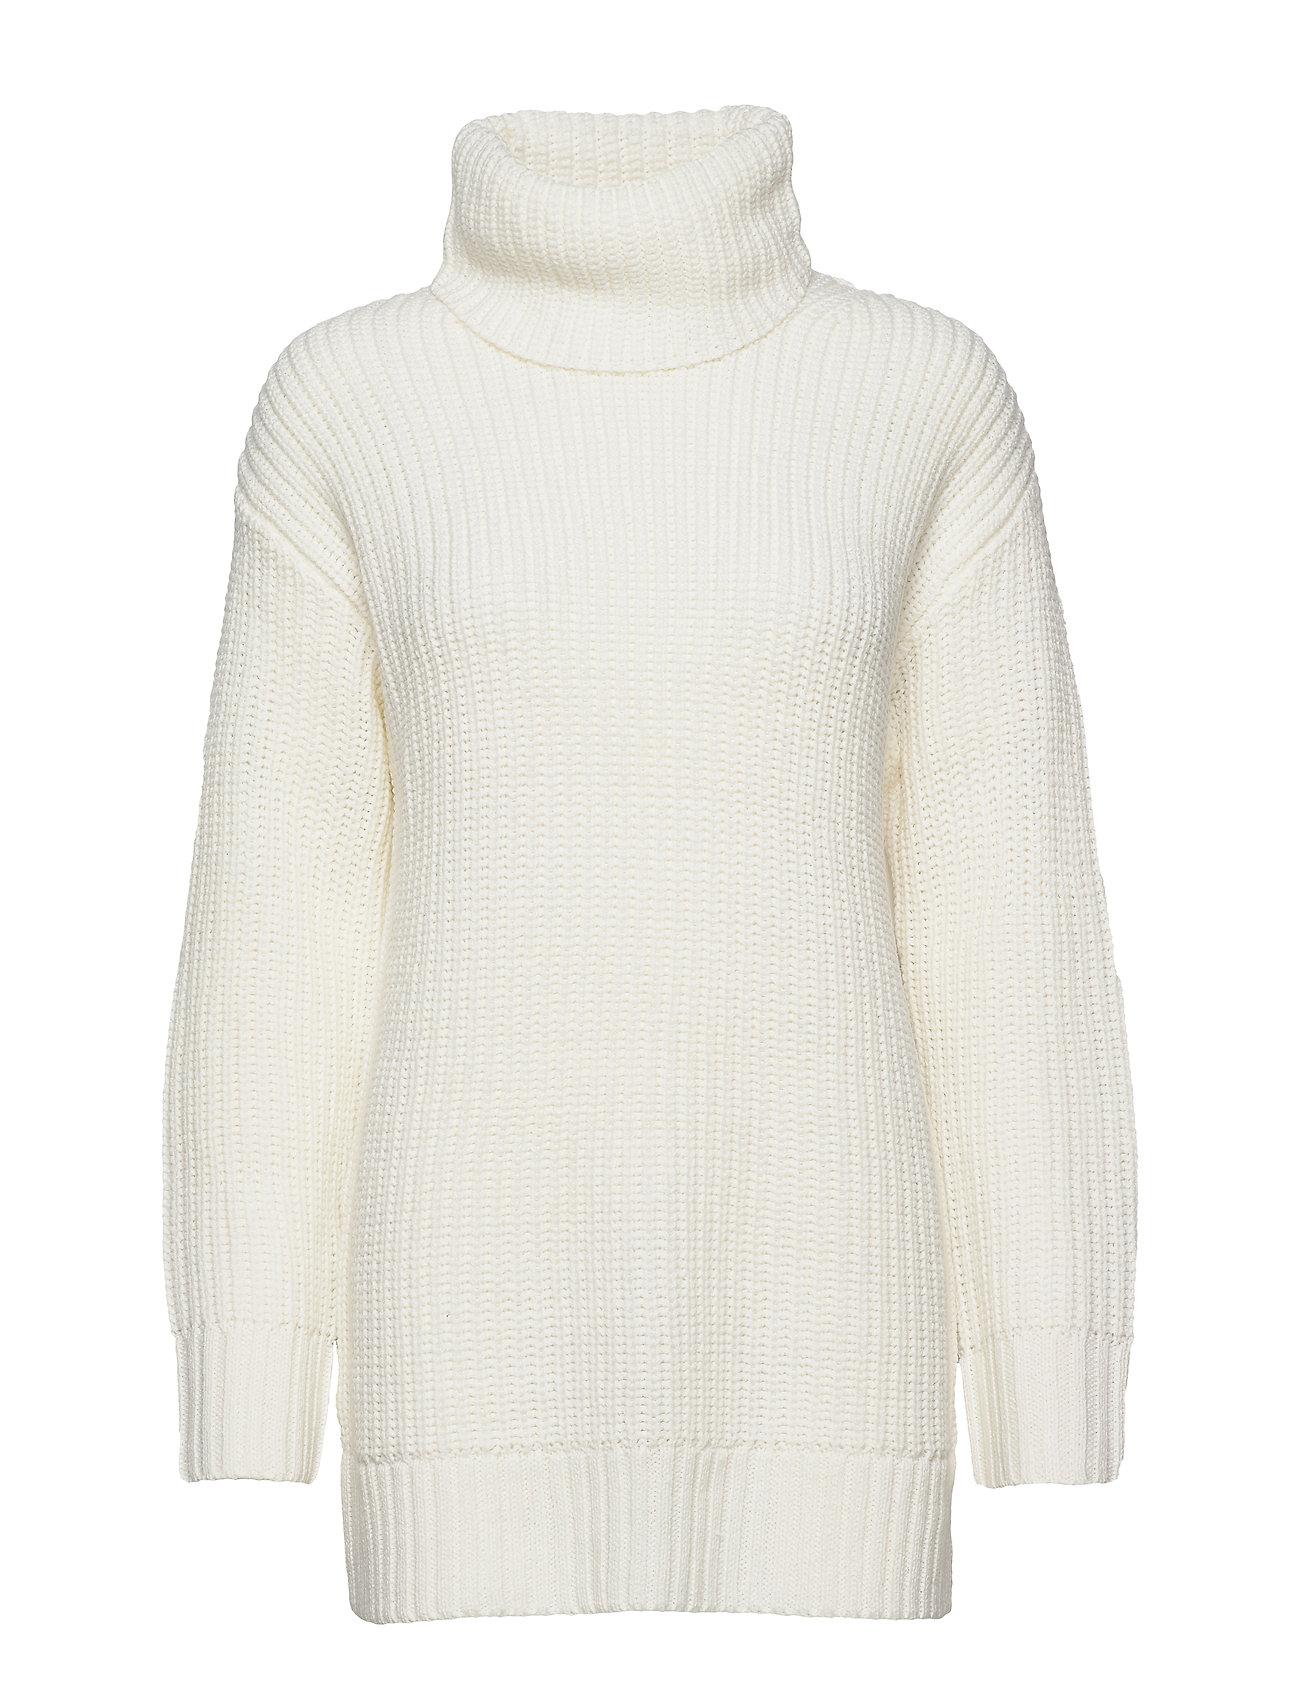 Gina Tricot Hera knitted tunic - OFFWHITE